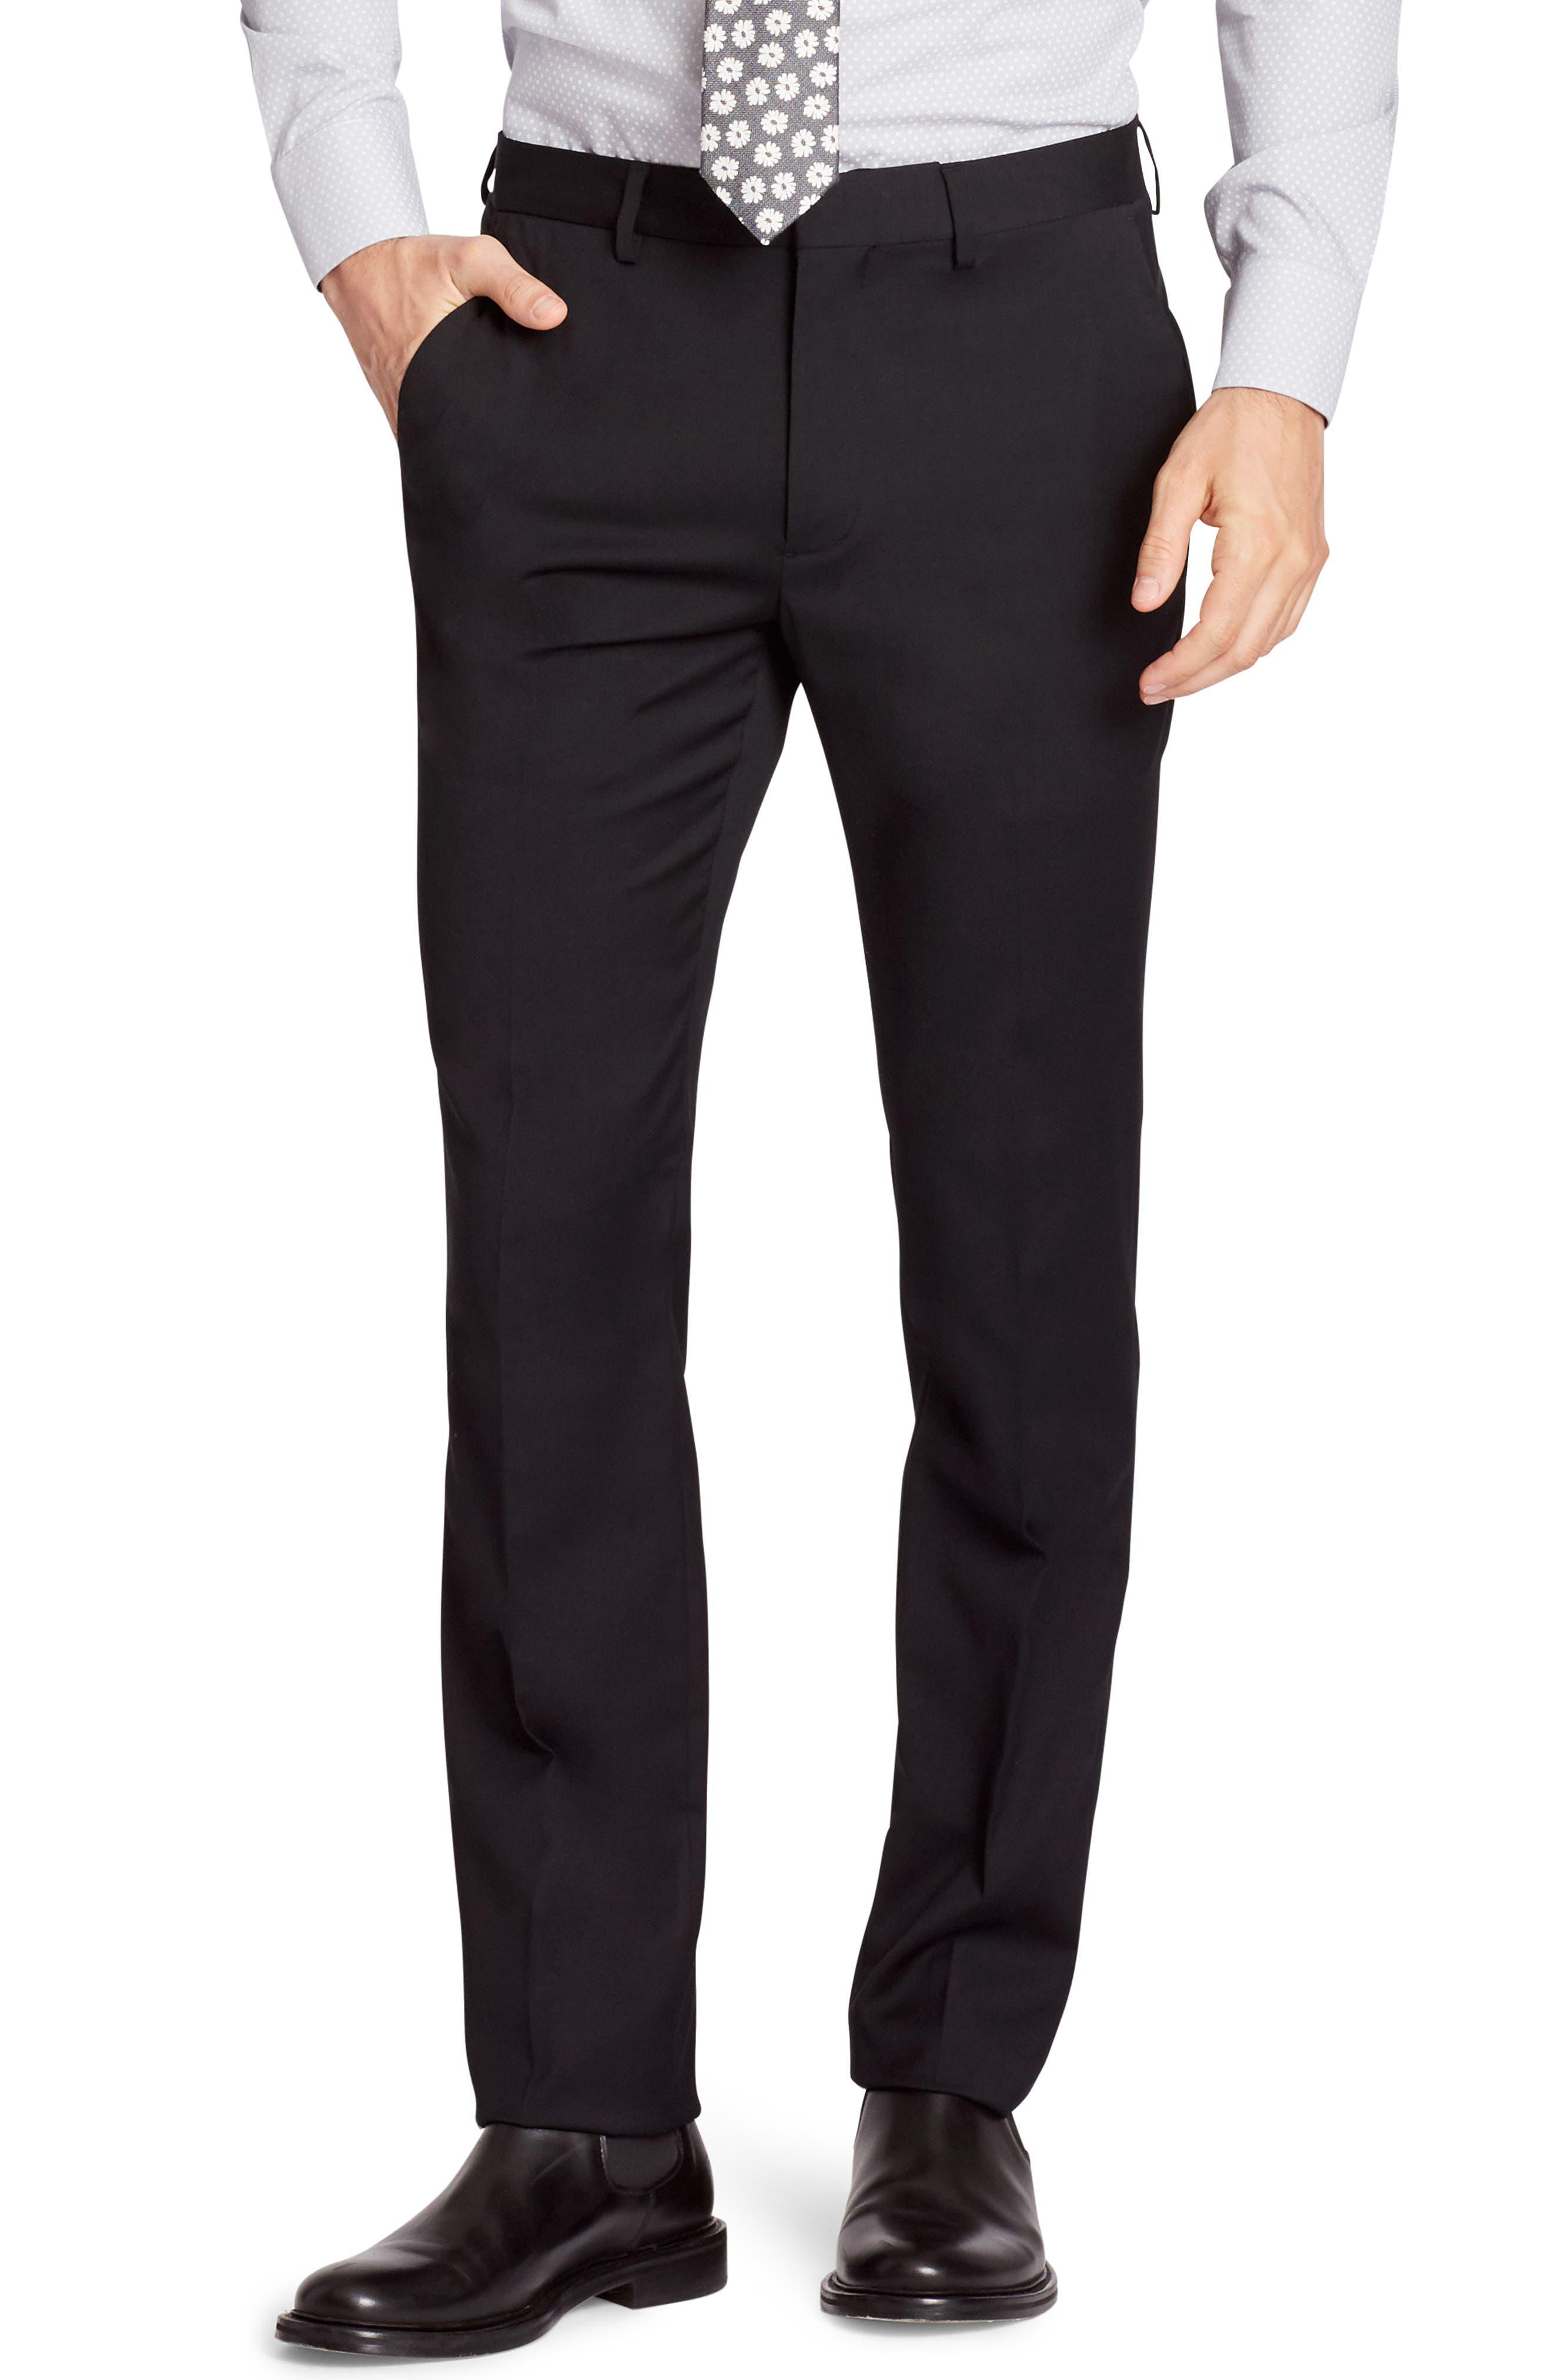 Jetsetter Slim Fit Flat Front Stretch Wool Dress Pants